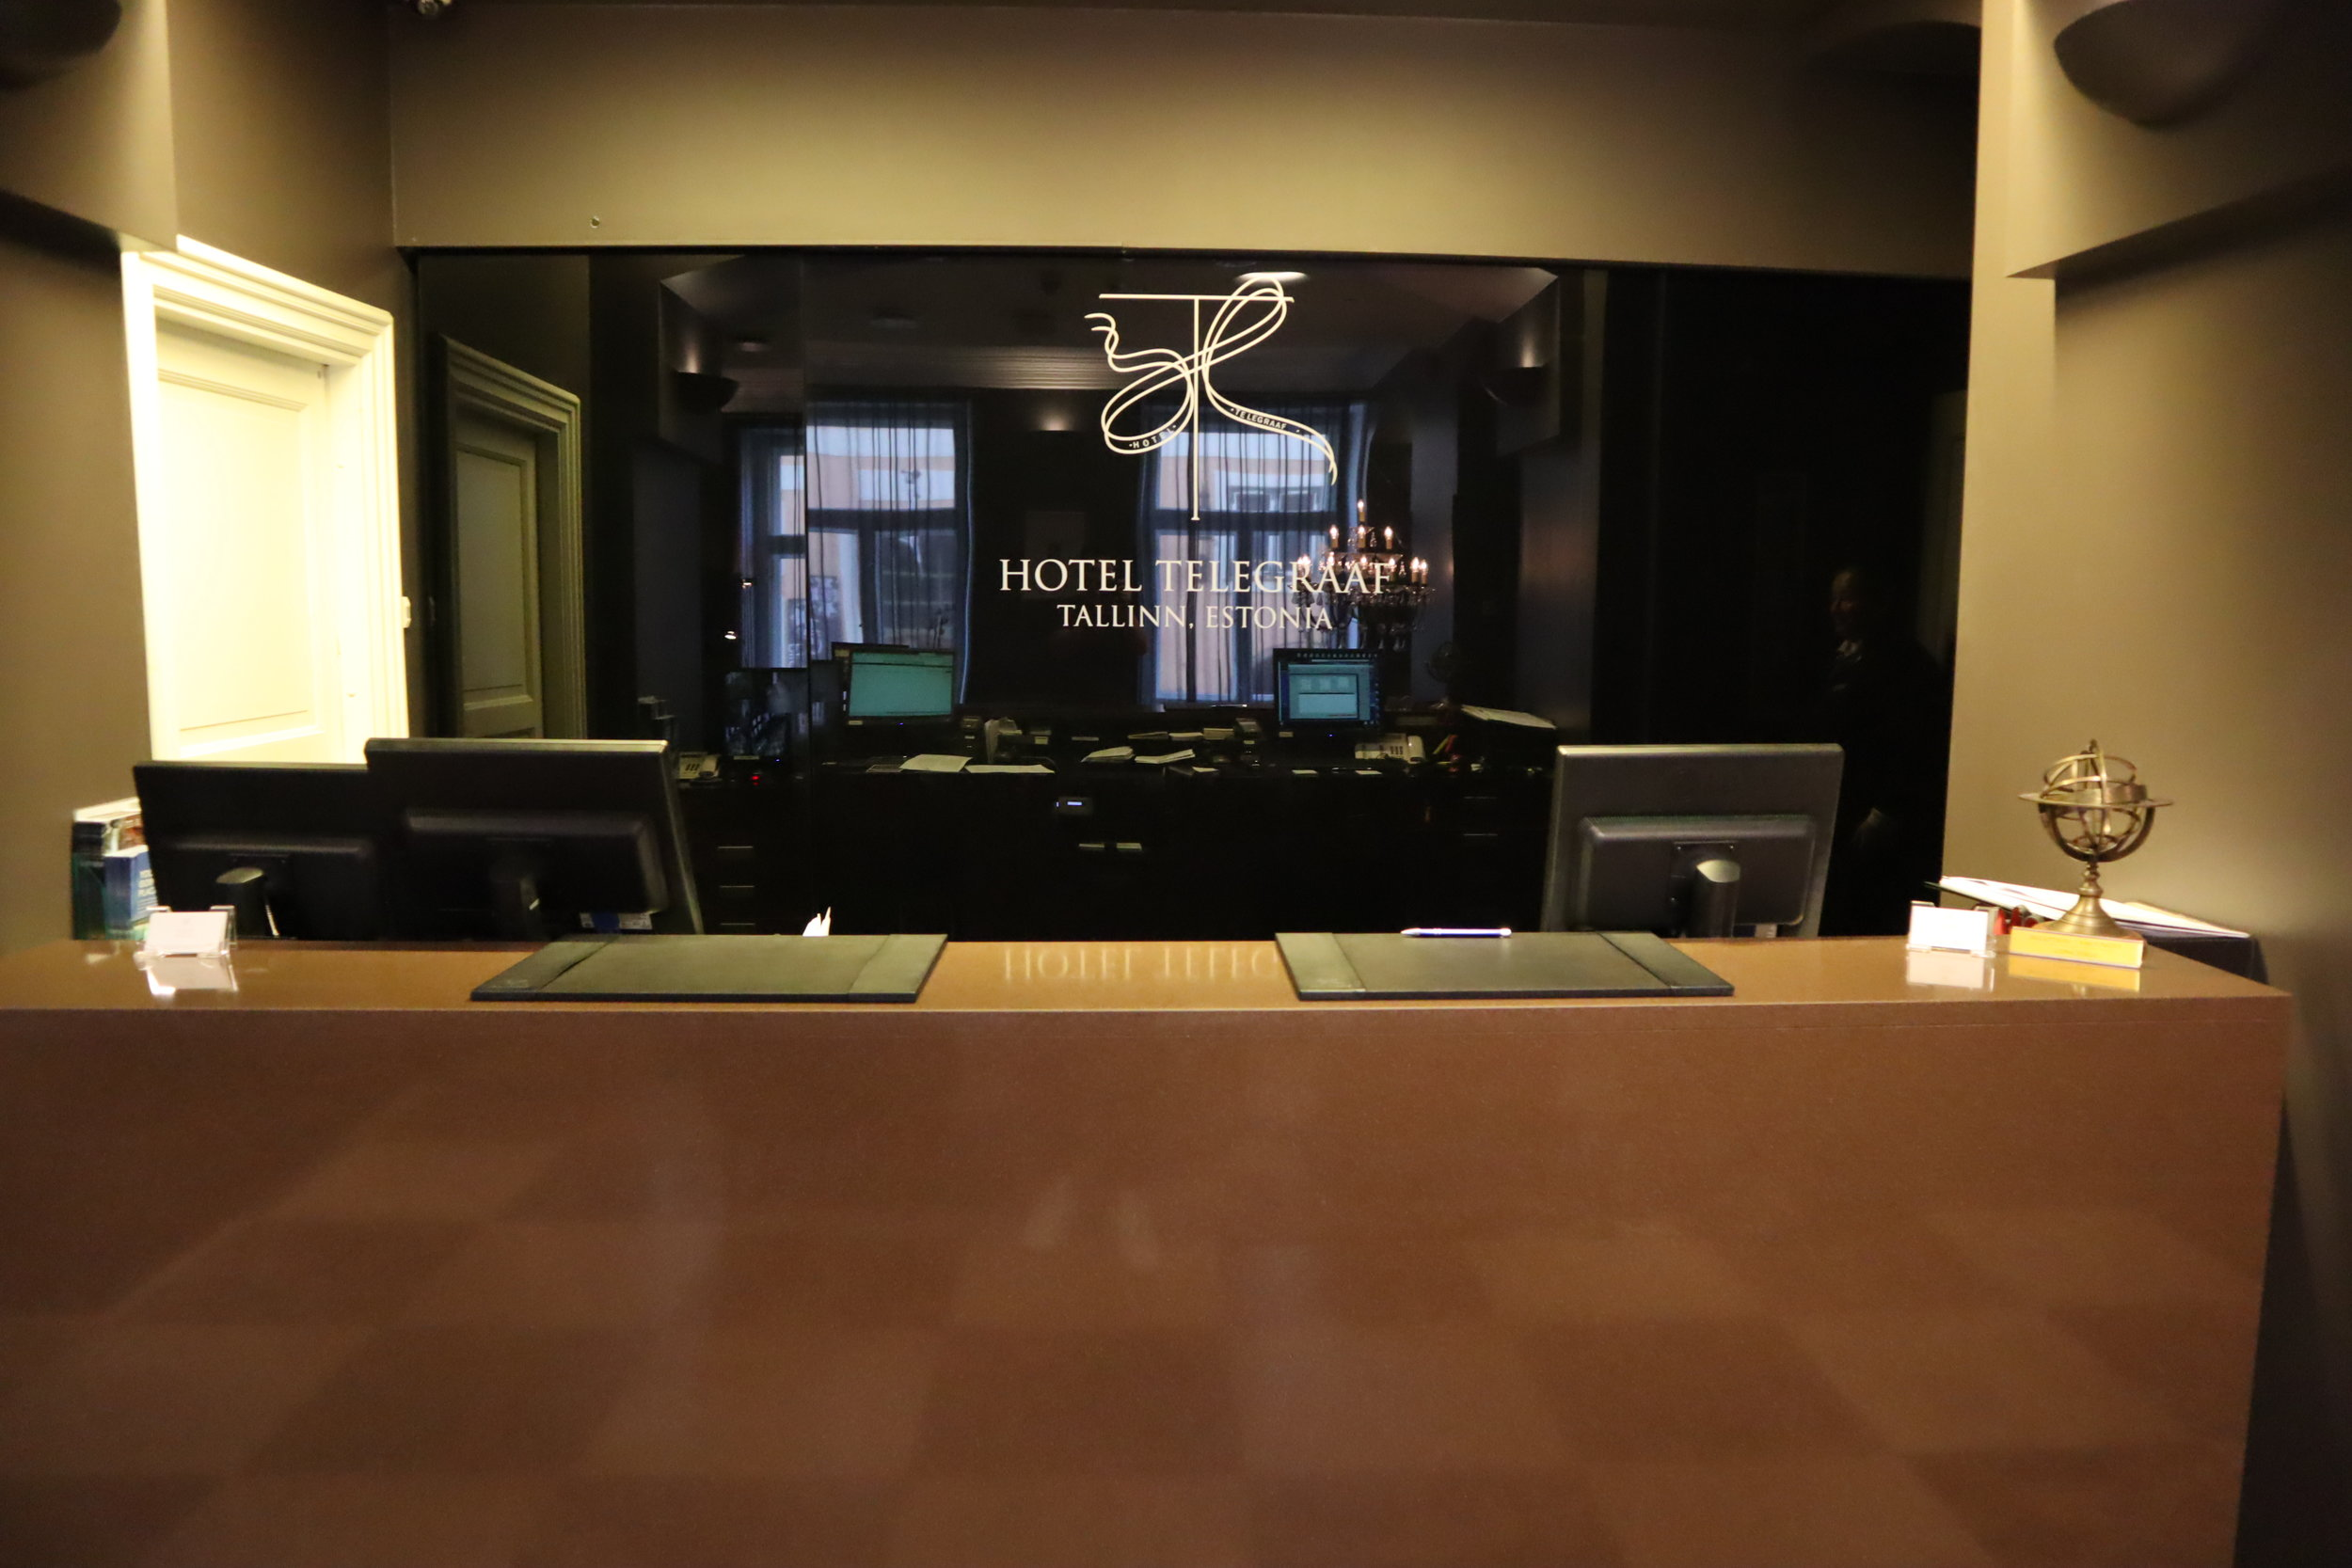 Hotel Telegraaf Tallinn – Front desk